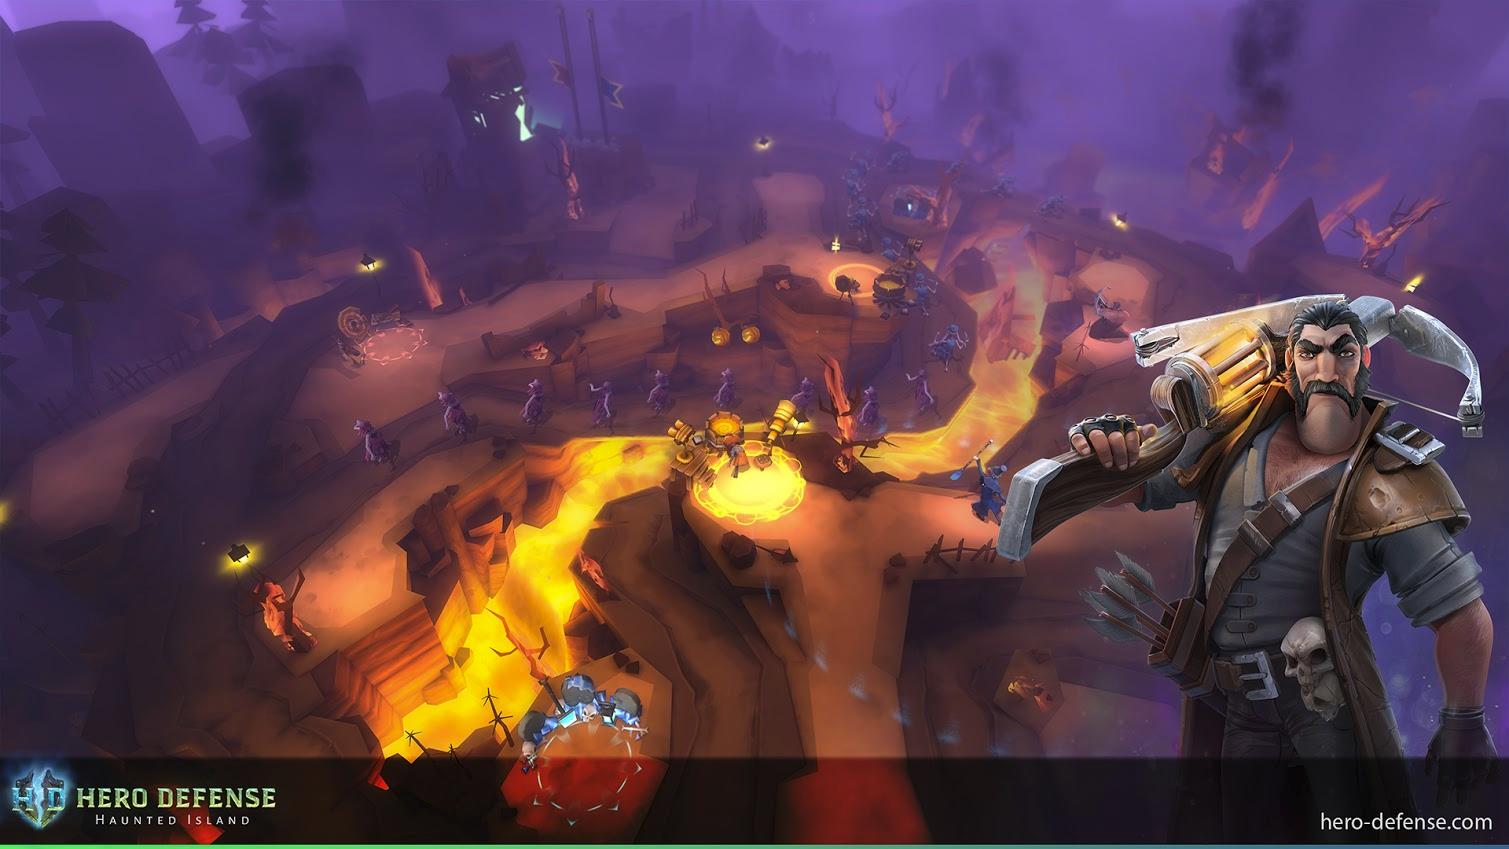 Hero Defense - Haunted Island Getting Multiplayer